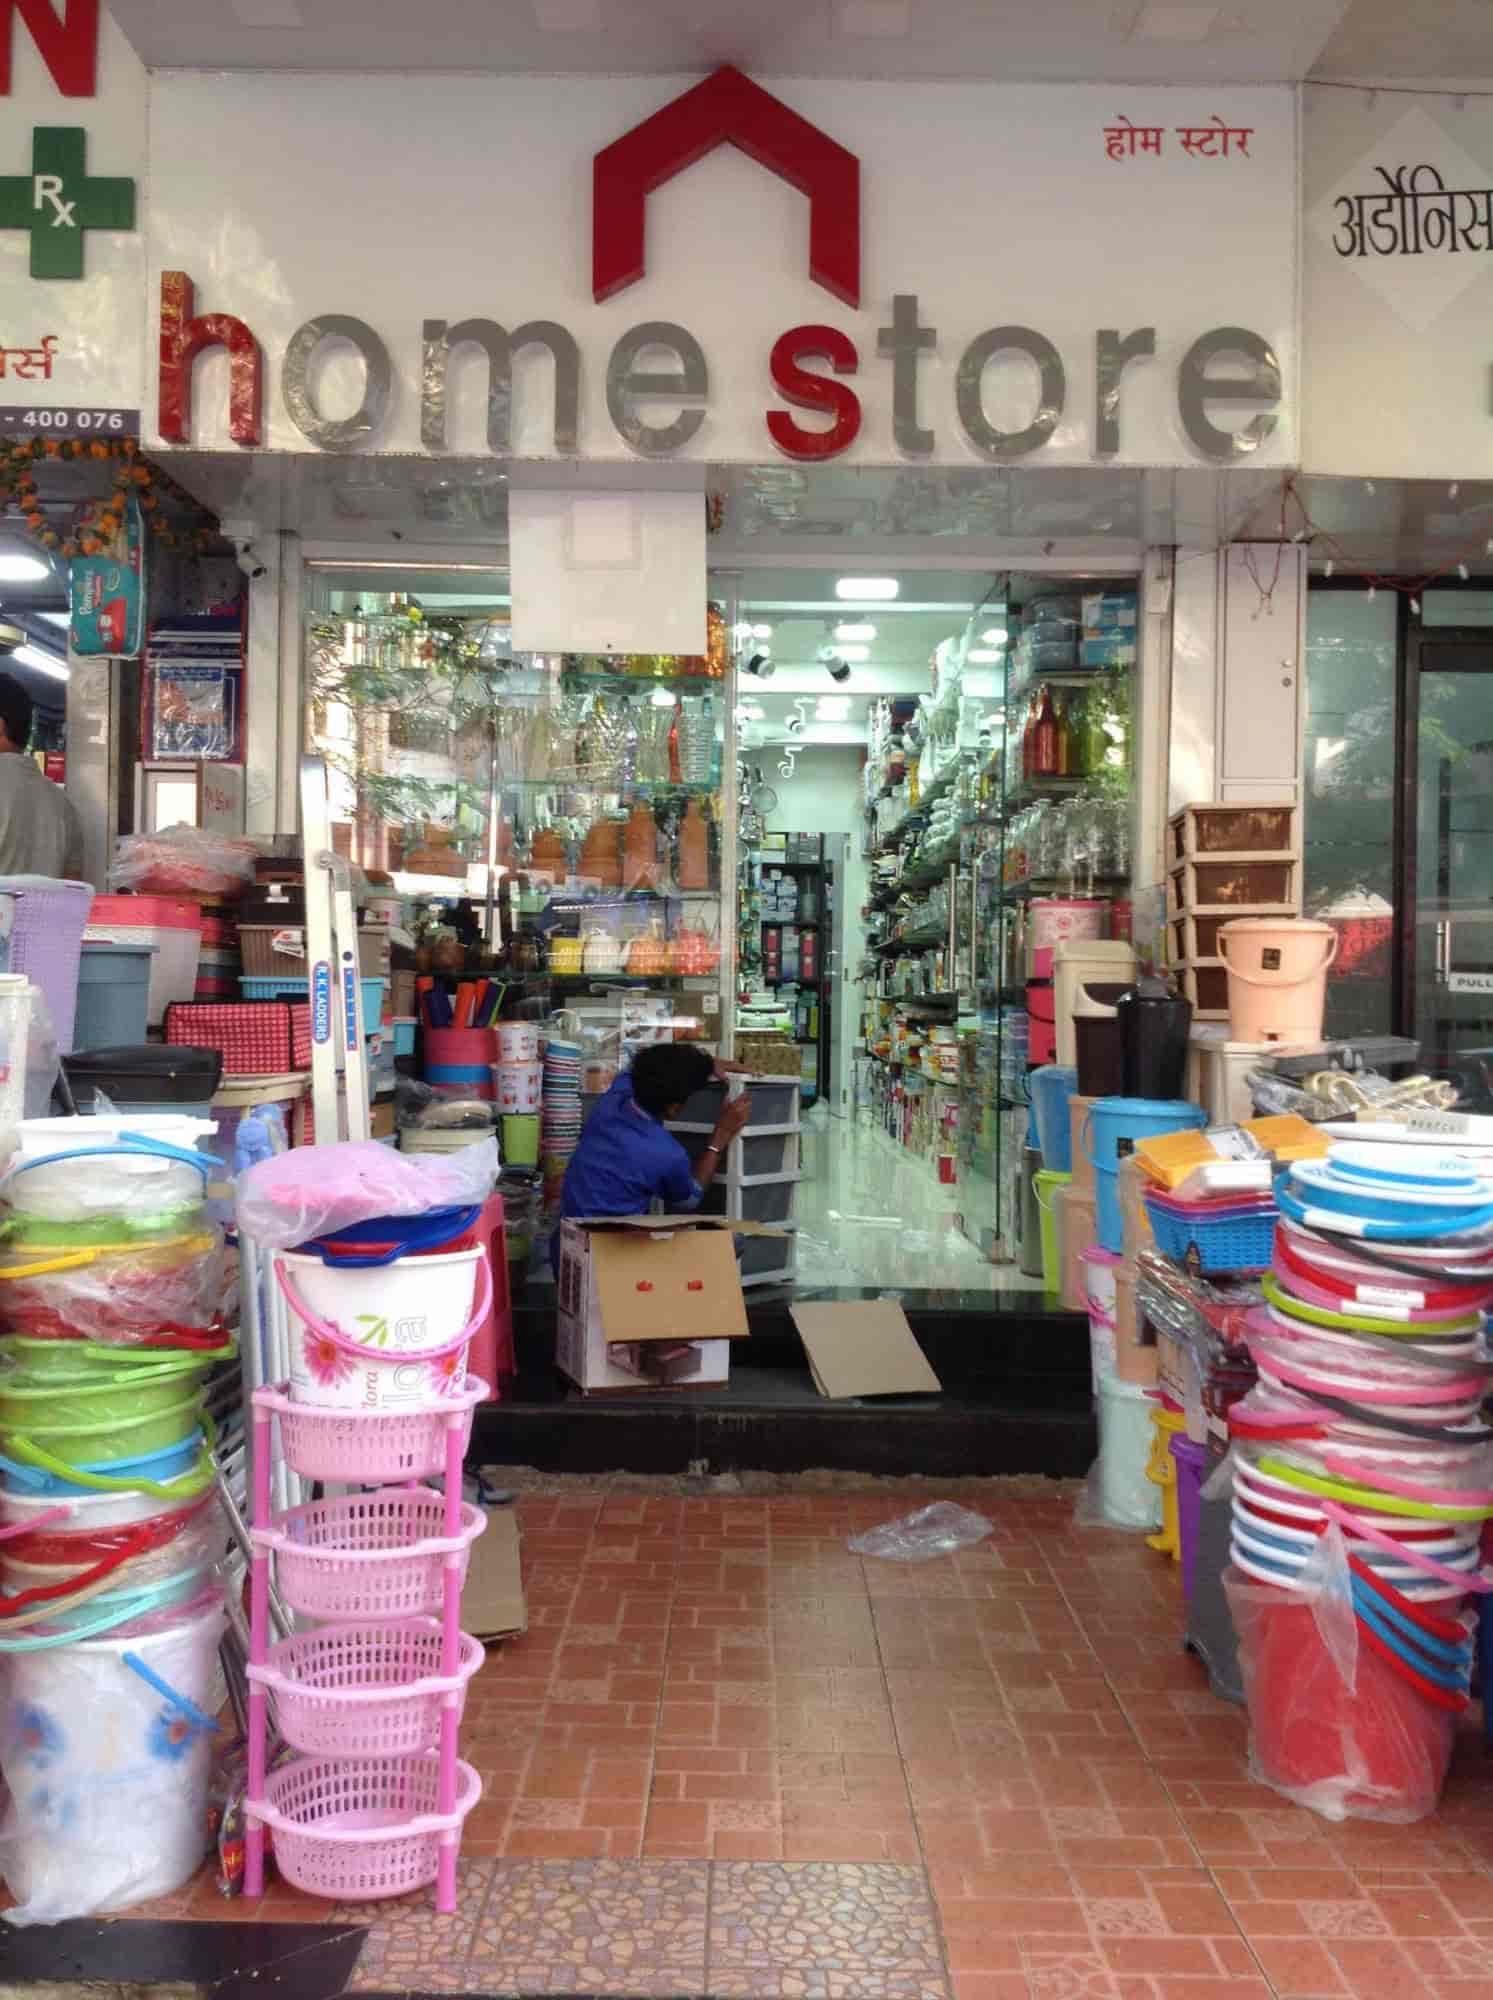 Home Store Photos Hiranandani Powai Mumbai Pictures Images